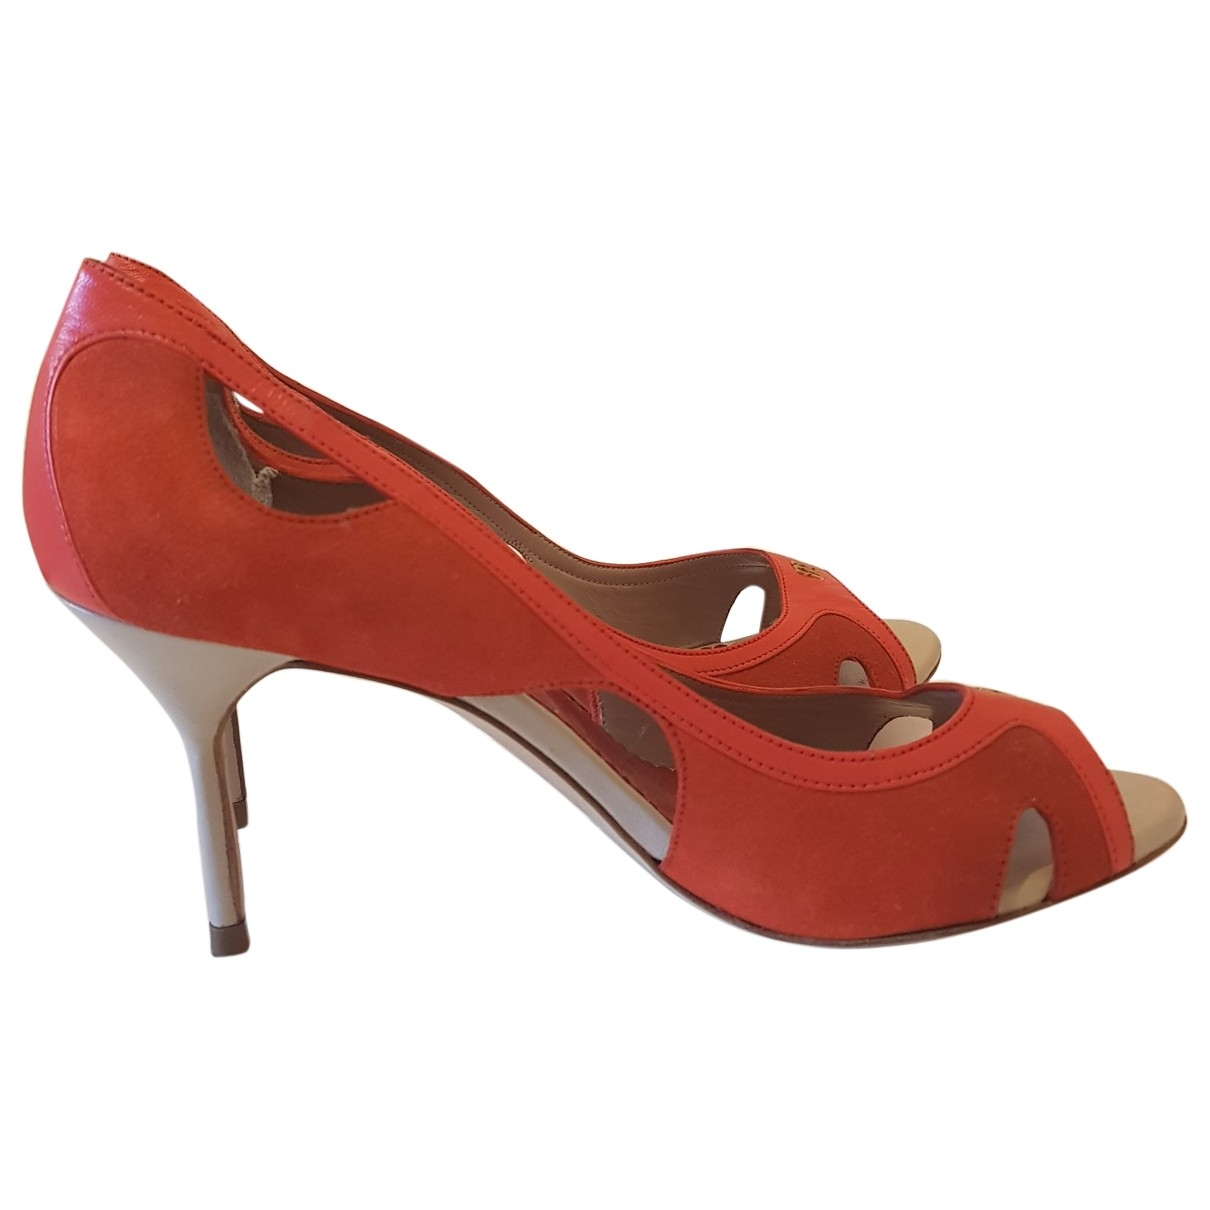 Carolina Herrera - Escarpins   pour femme en suede - rouge